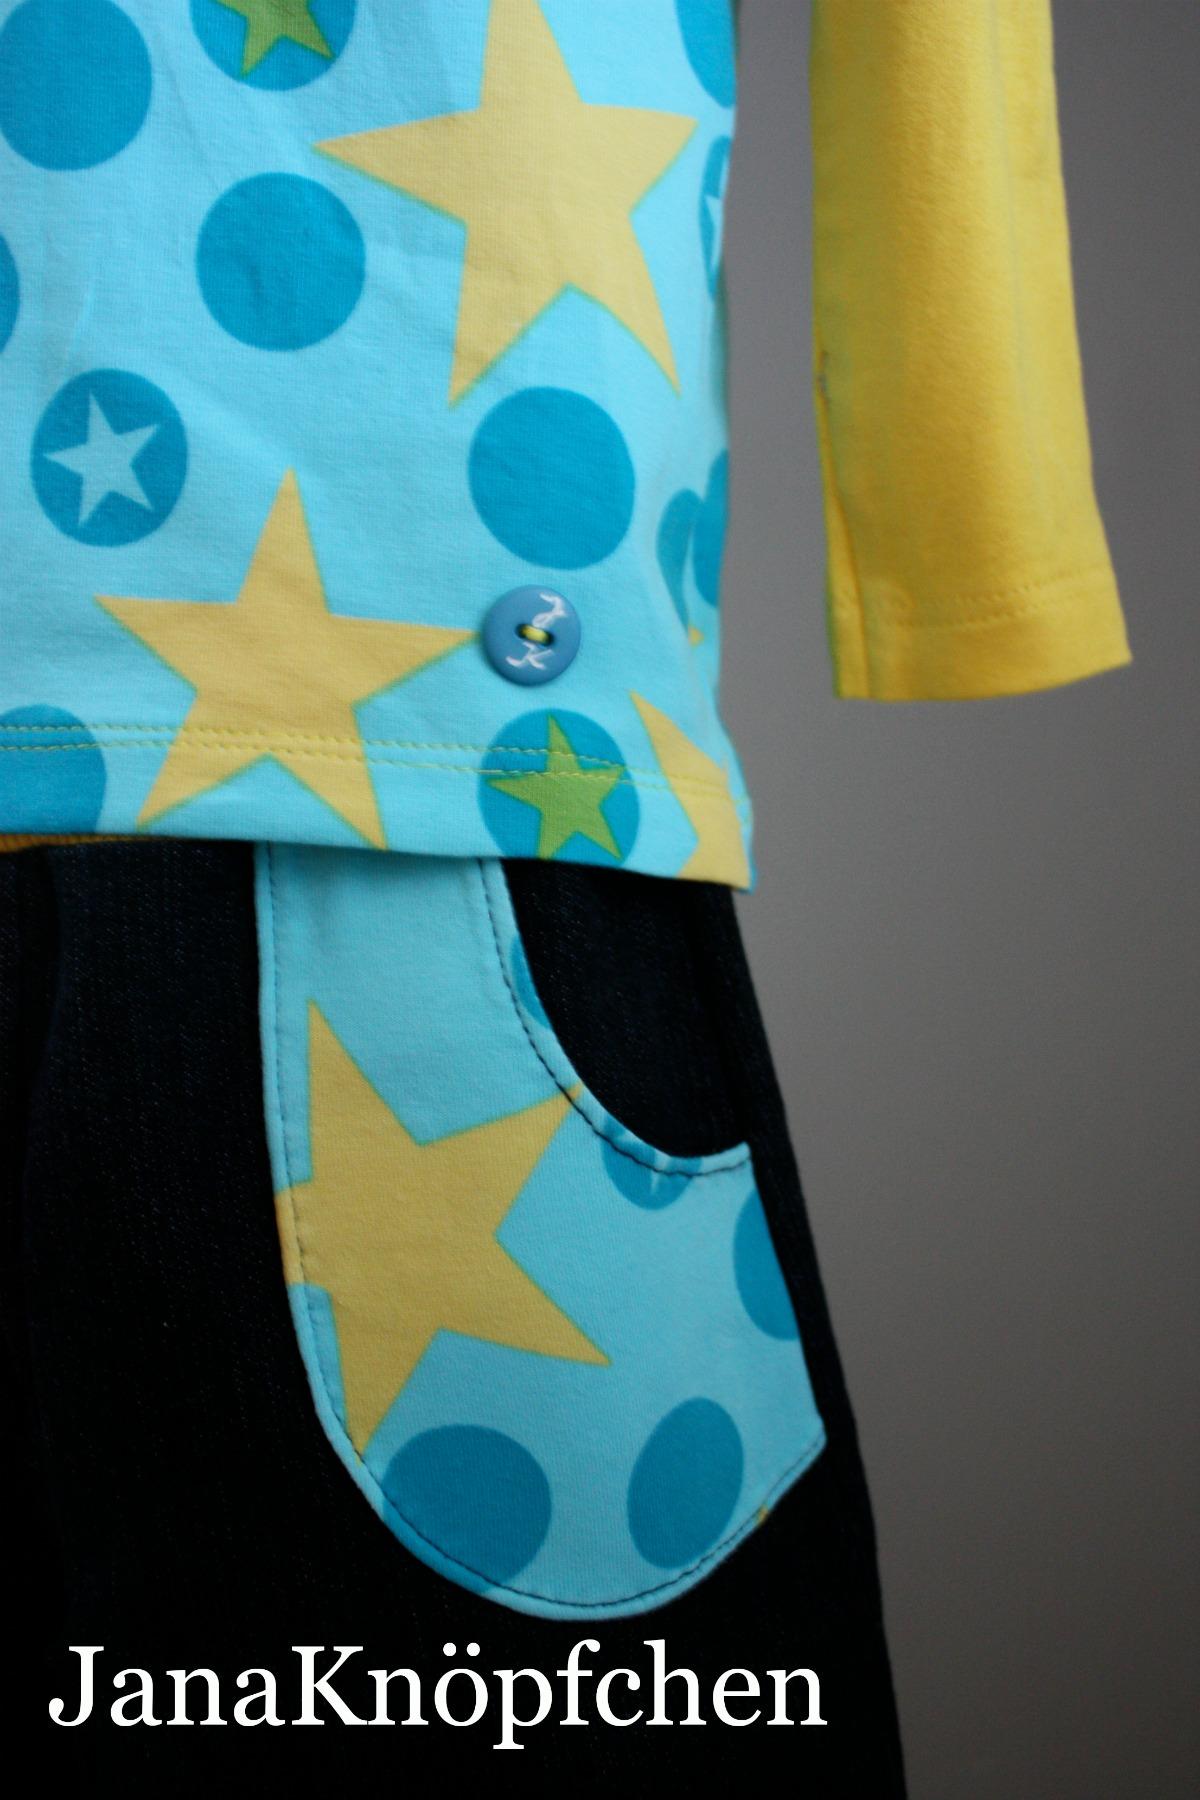 JanaKnoepfchen_Shirt+Hose Detail.jpg